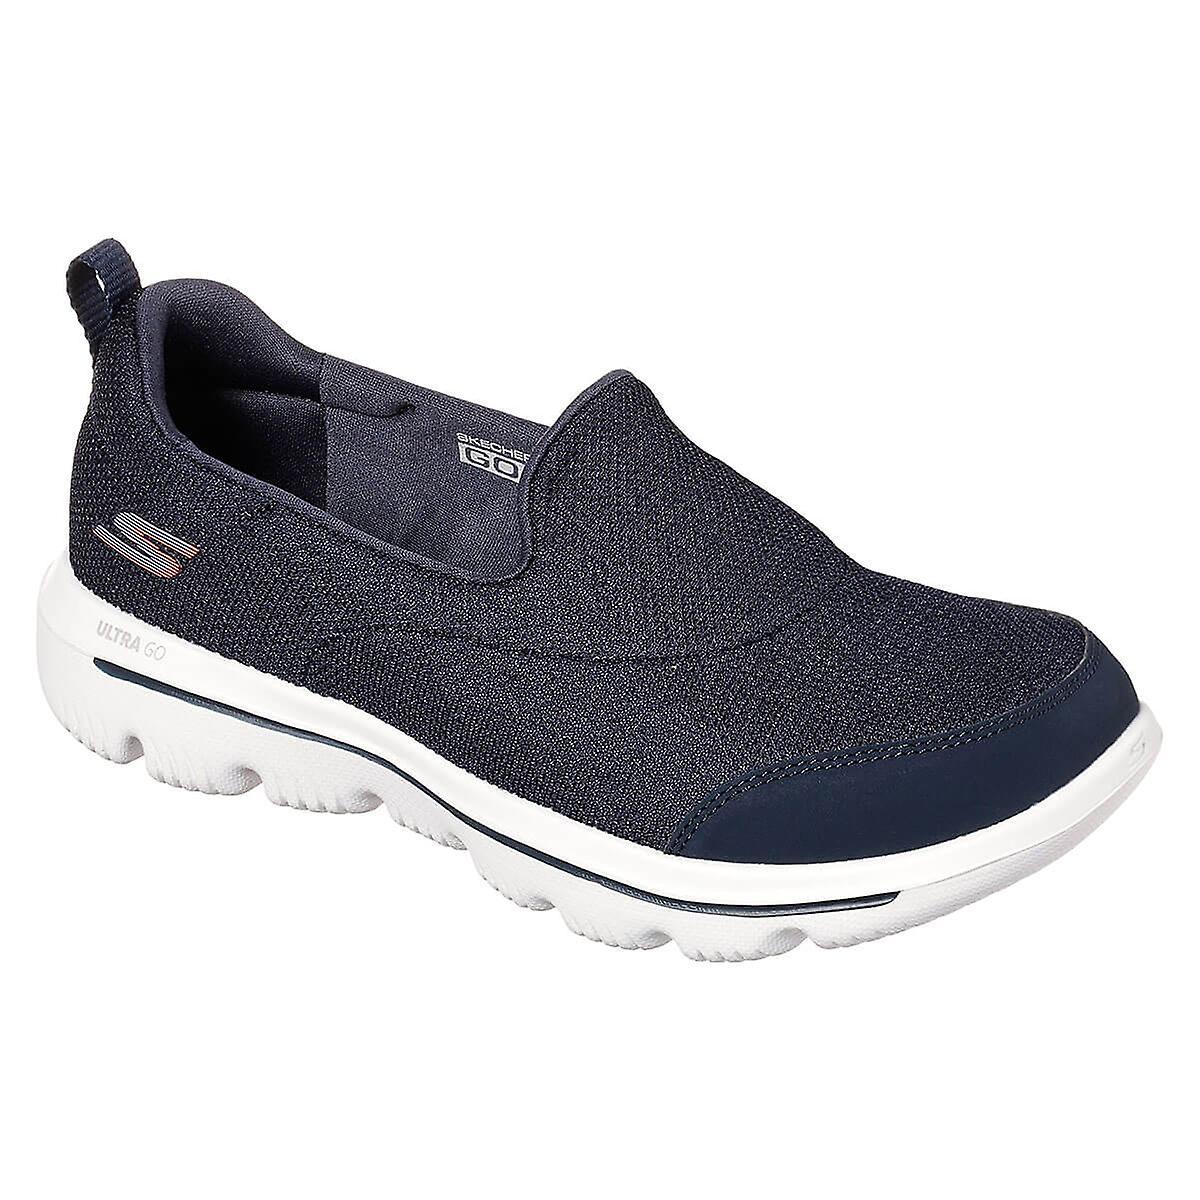 Ladies: Skechers Go Walk Reach Shoe in Black